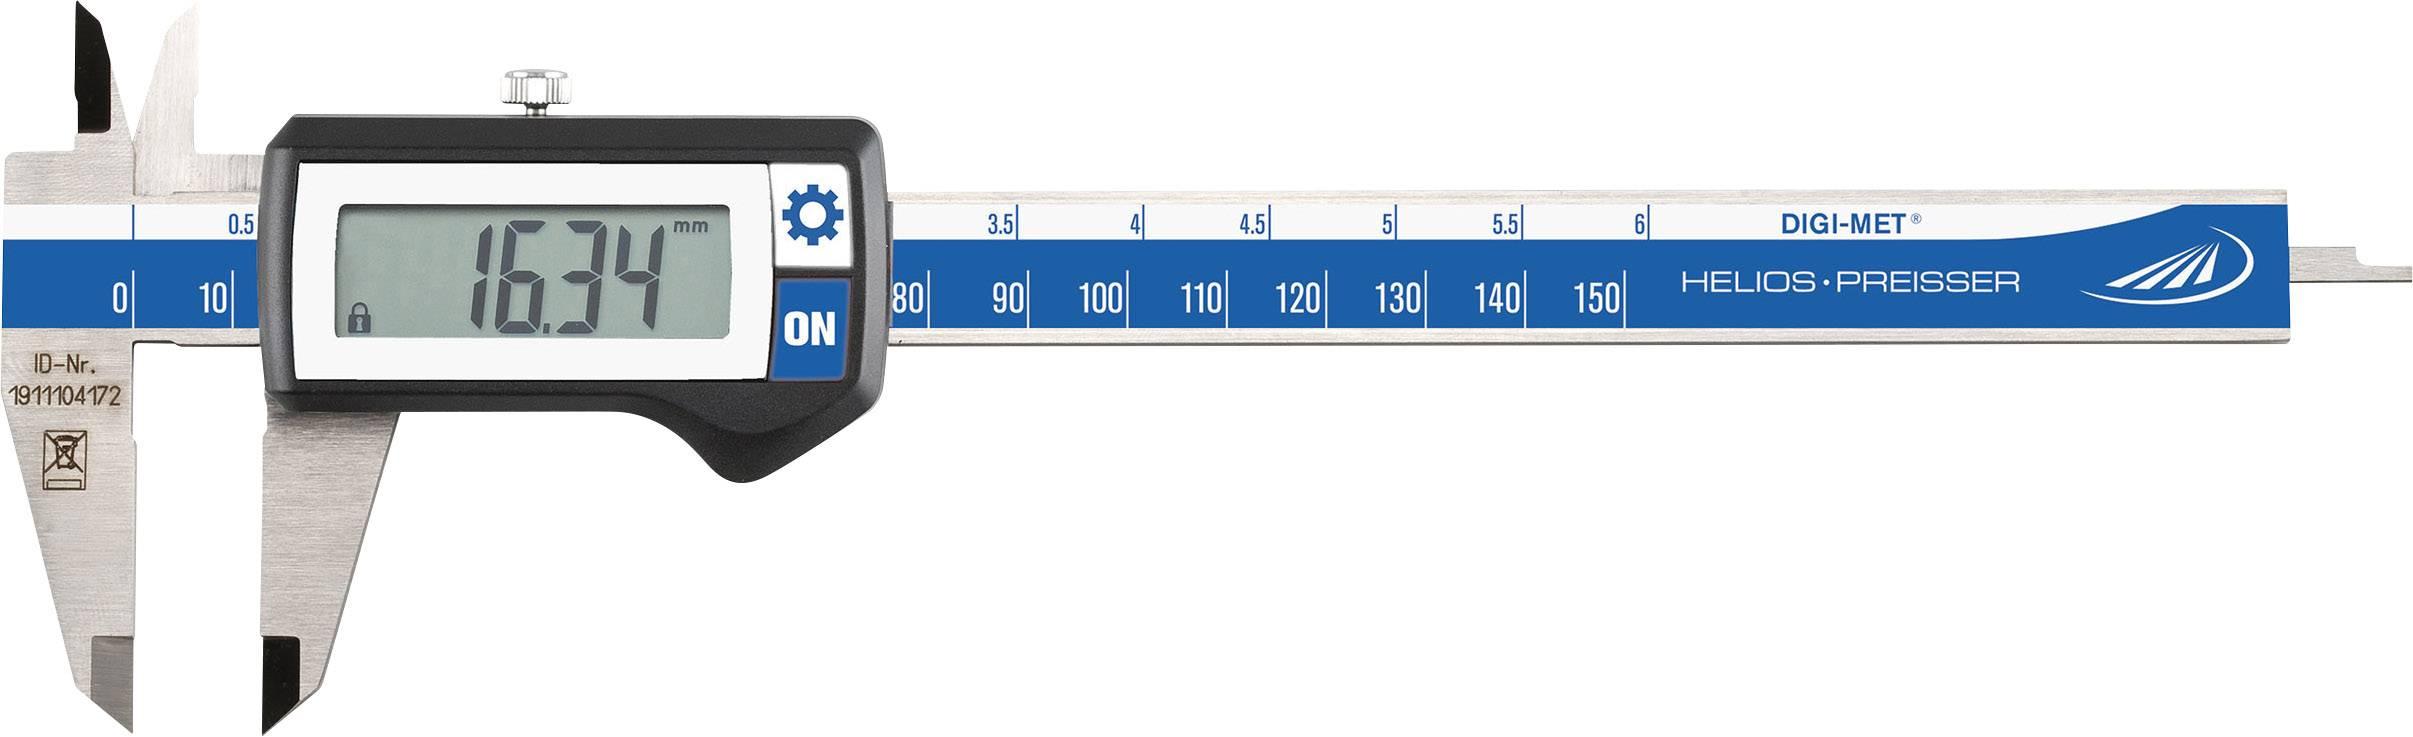 Digitálne posuvné meradlo Helios Preisser DIGI-MET 1320 417, rozsah merania 150 mm